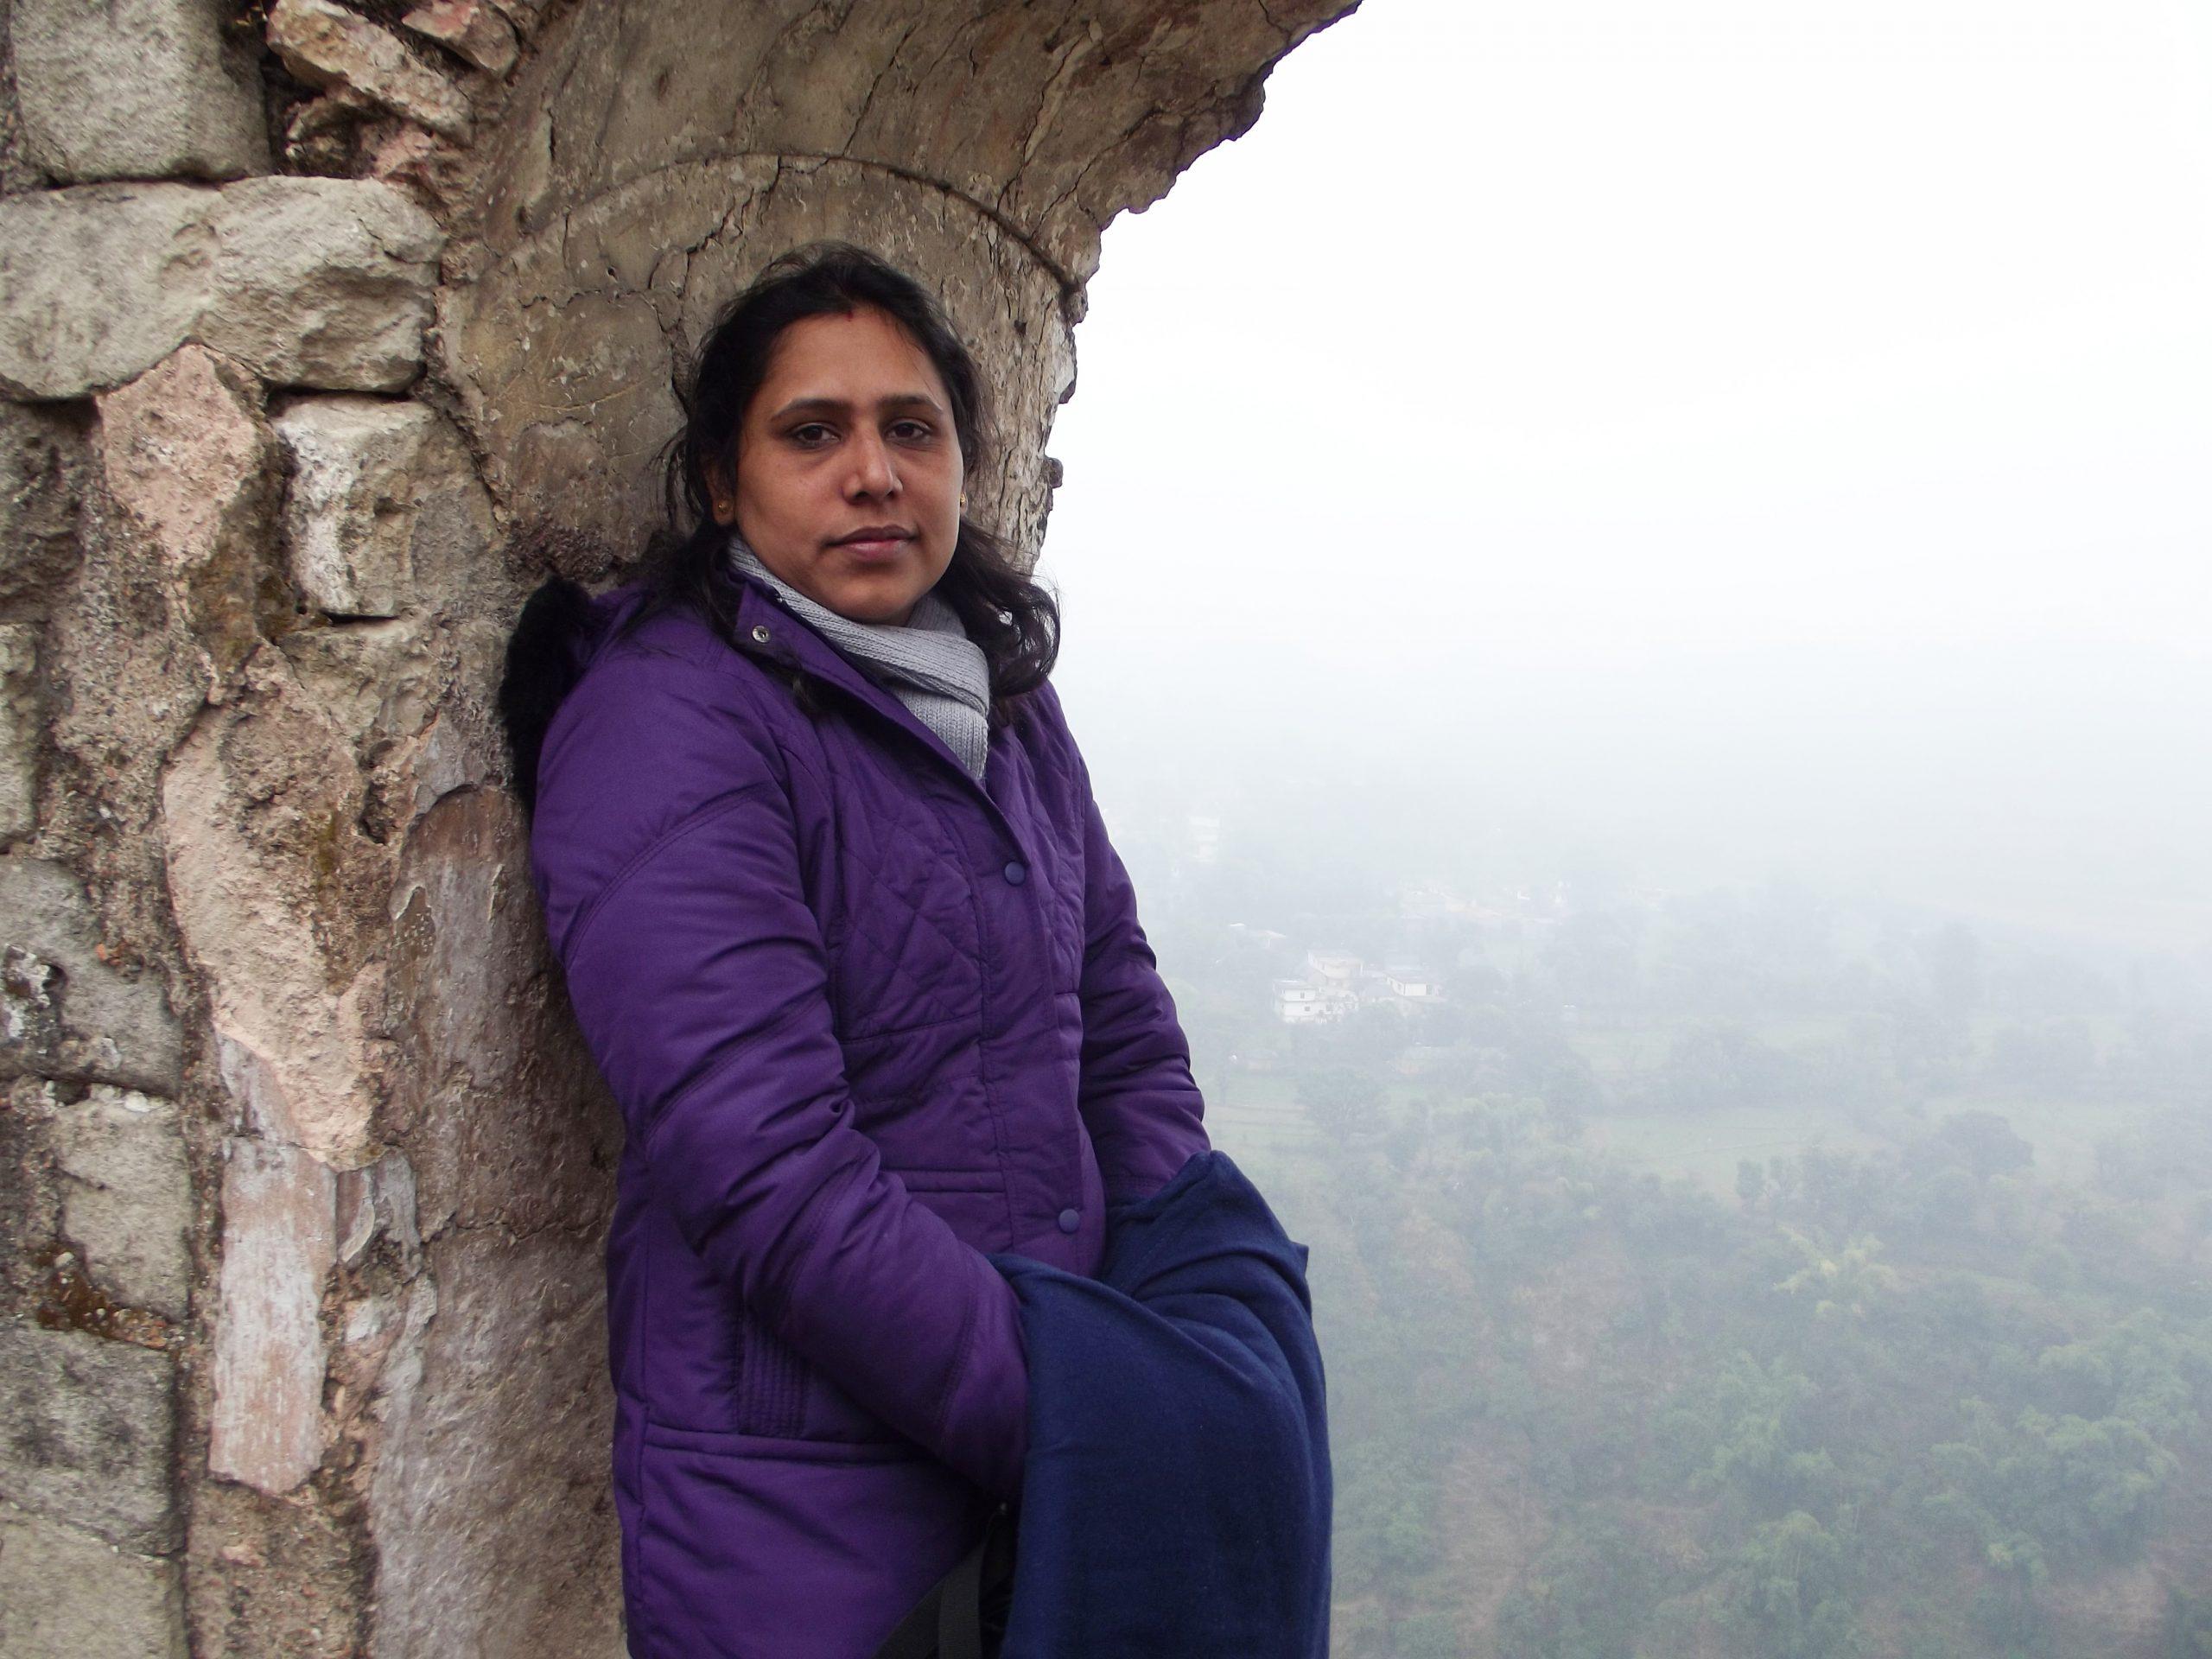 Woman posing near the wall